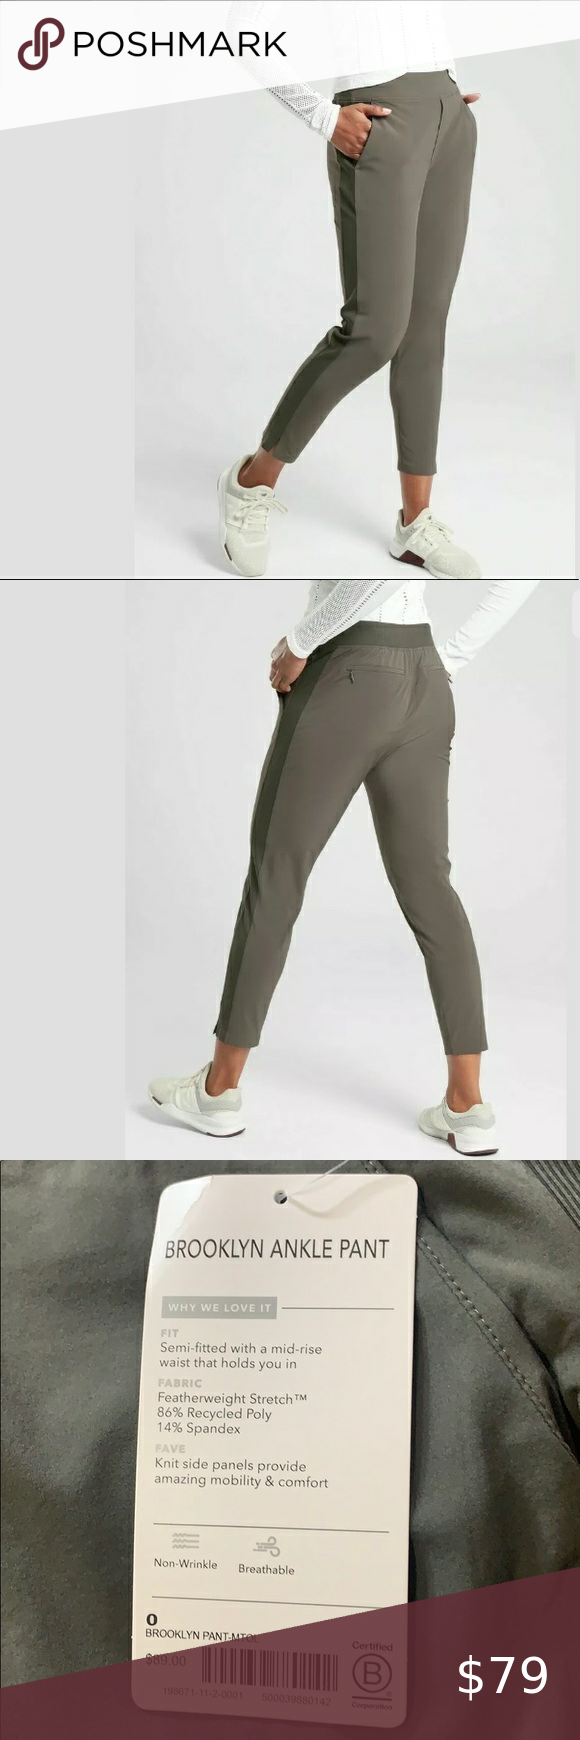 ATHLETA Brooklyn Ankle Lightweight Travel Pant Black  Women Size 10 T  NWT